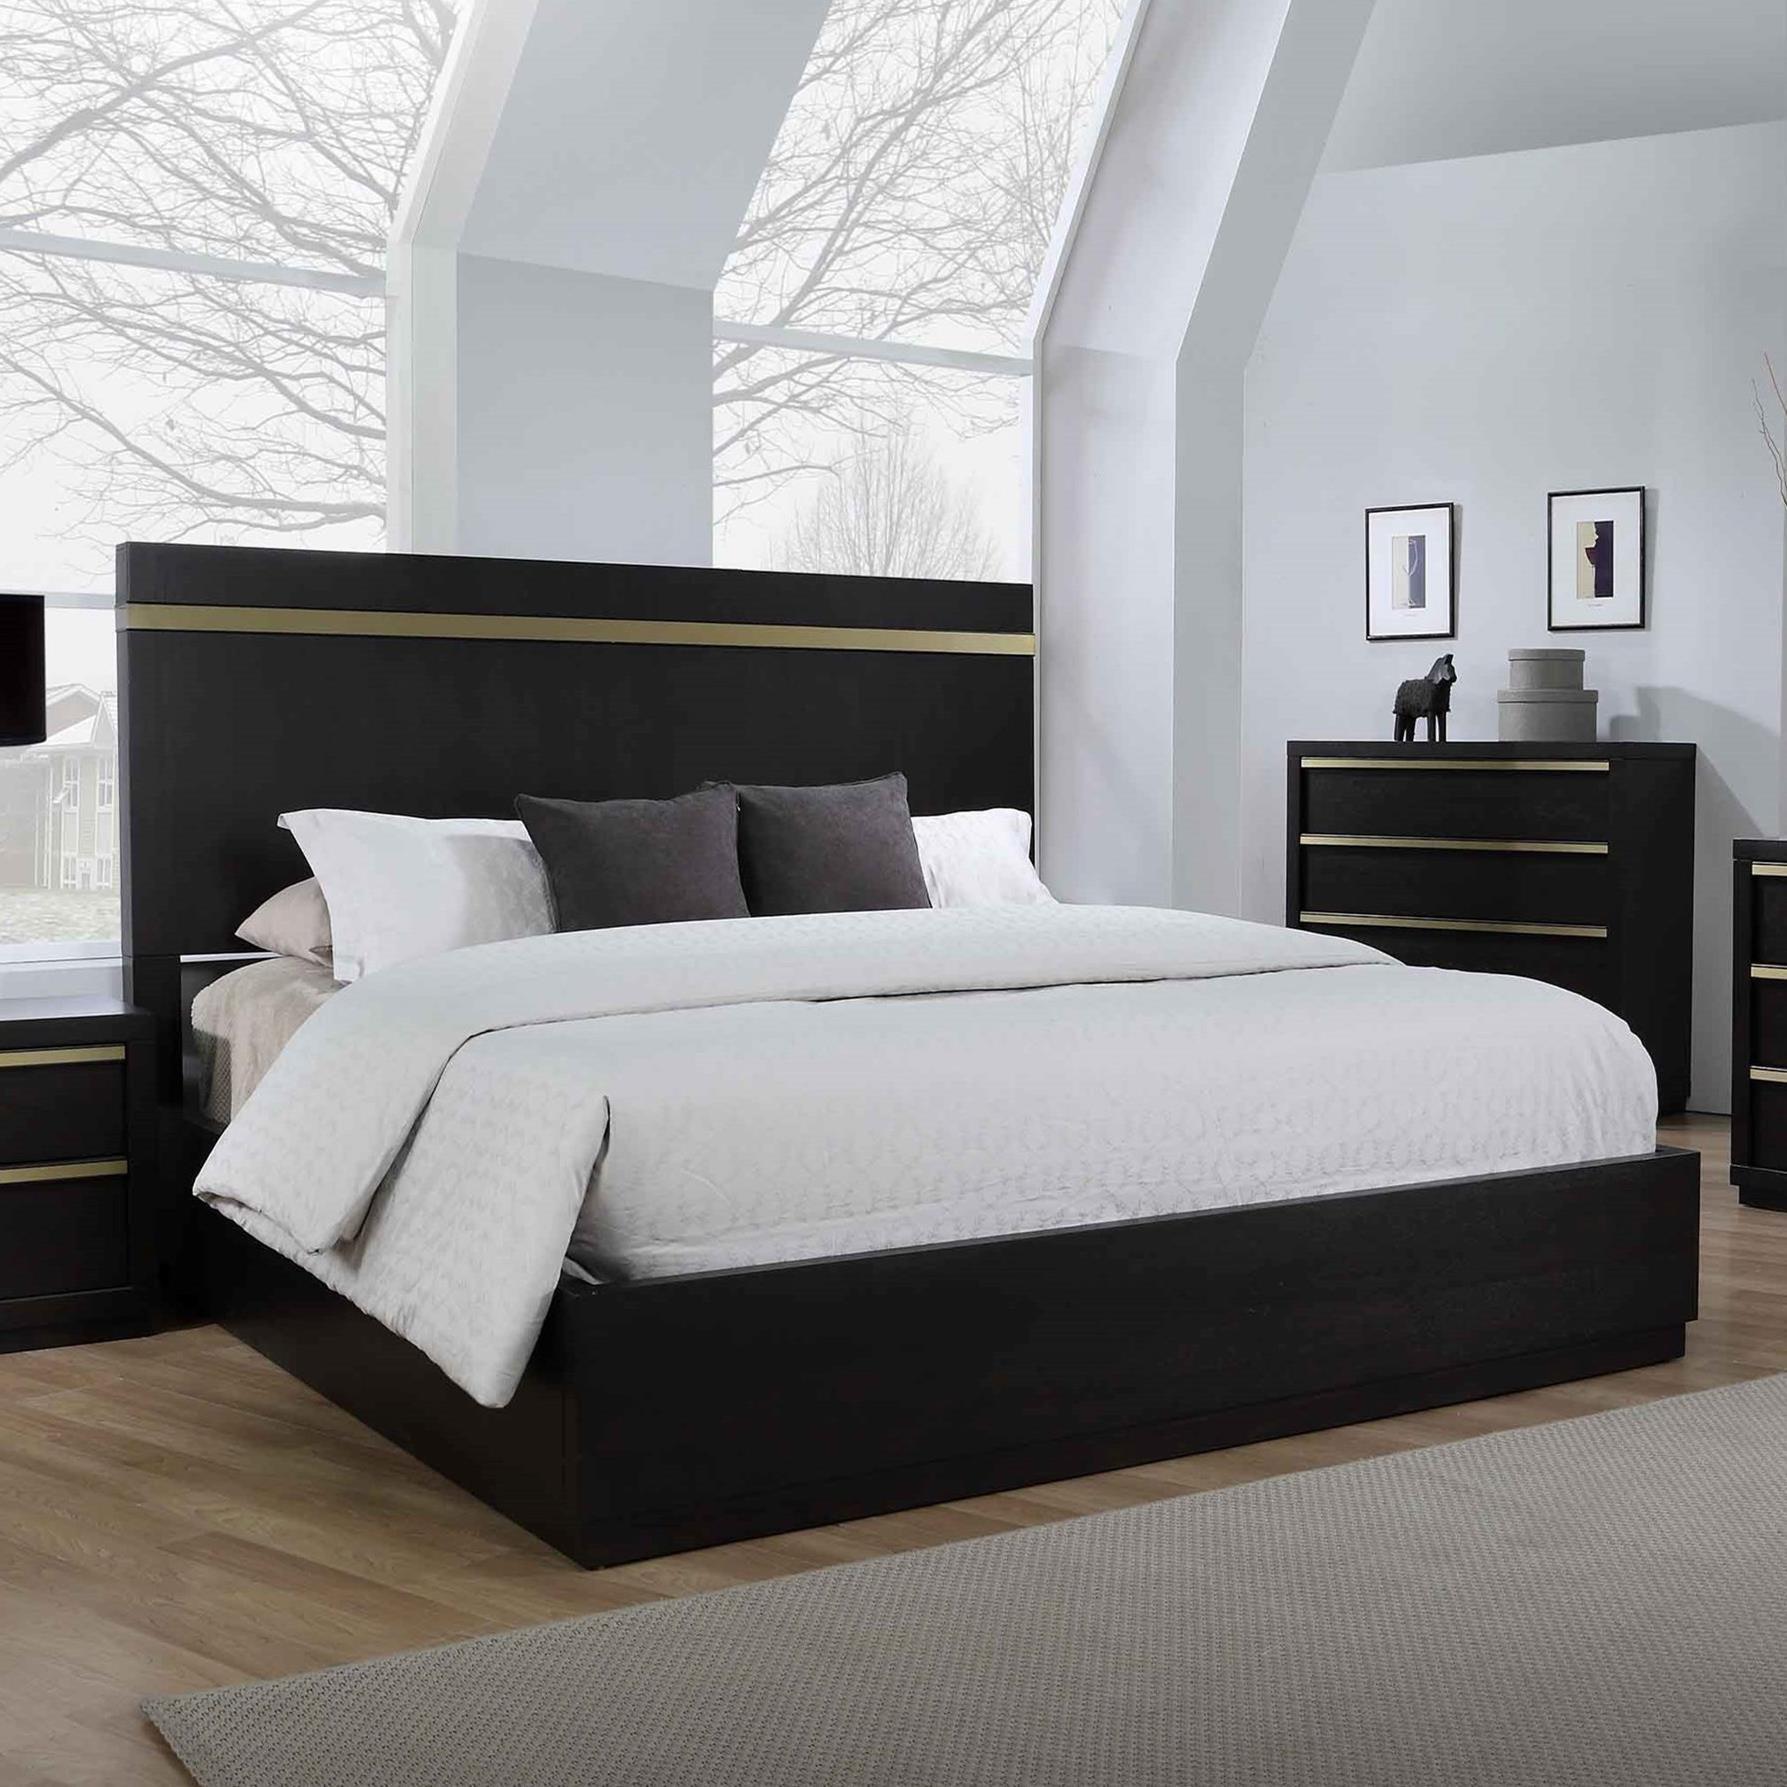 Picture of: Crown Mark Lastra Contemporary King Platform Bed Royal Furniture Platform Beds Low Profile Beds